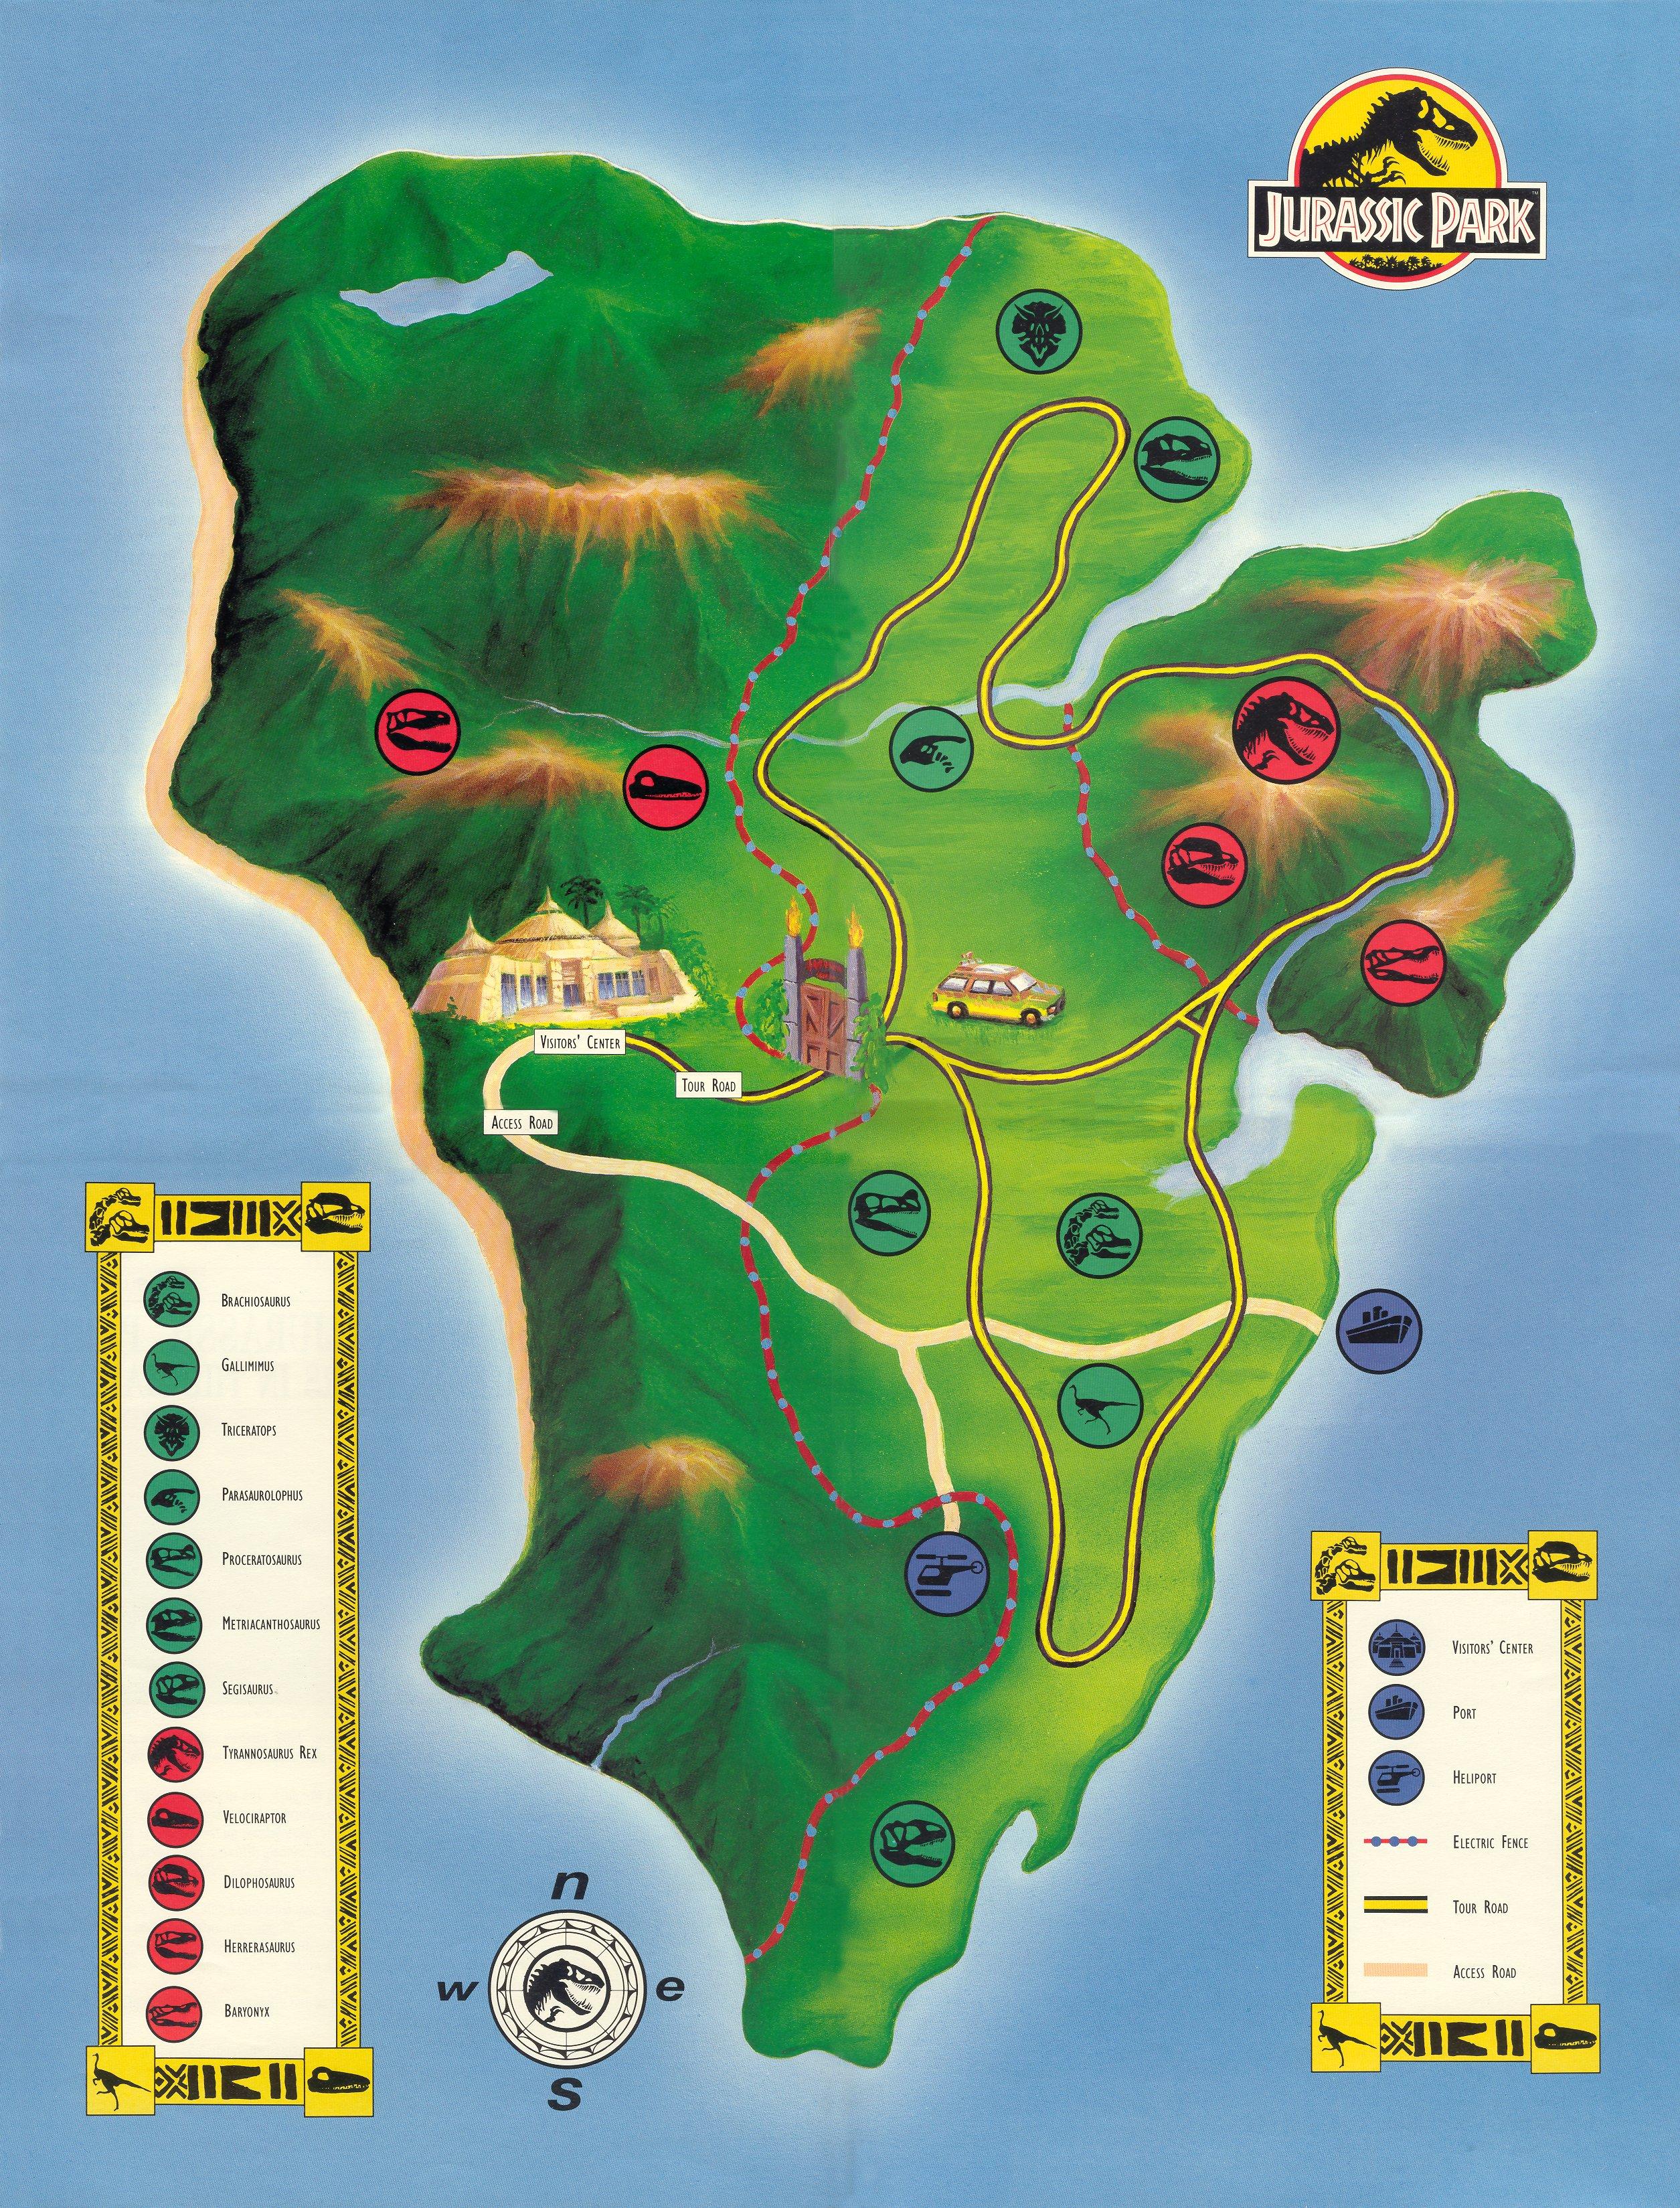 Jurassic World Map Pdf. Jurassic Park brochure  wiki FANDOM powered by Wikia